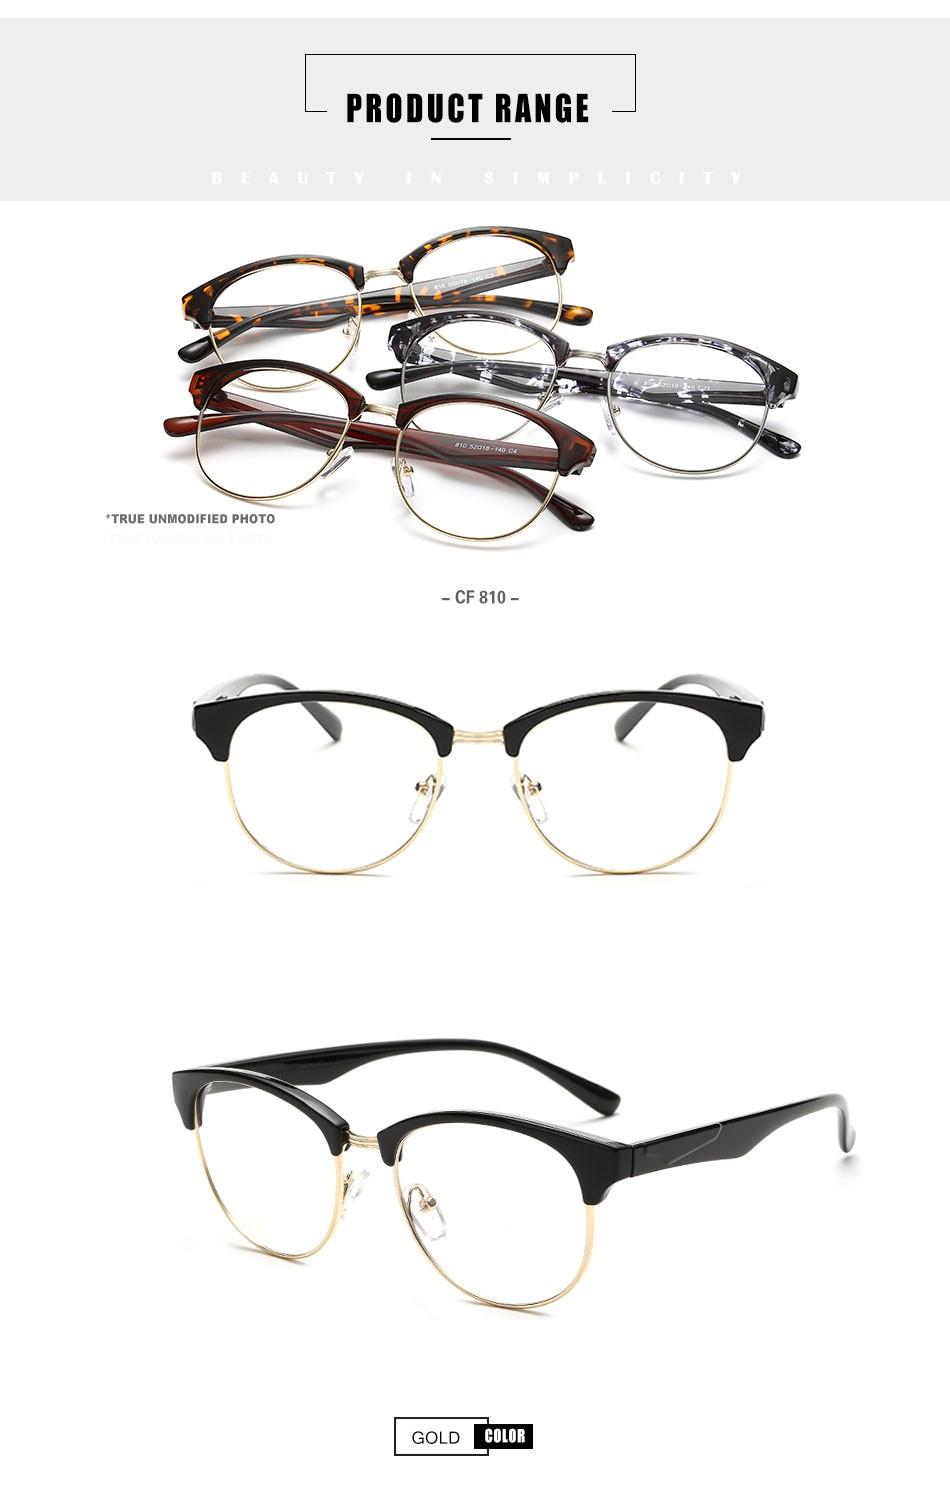 Zenni Optical Mens Rimless Glasses : Cf810 Fashion Round Semi-rimless Nice Zenni Optical ...